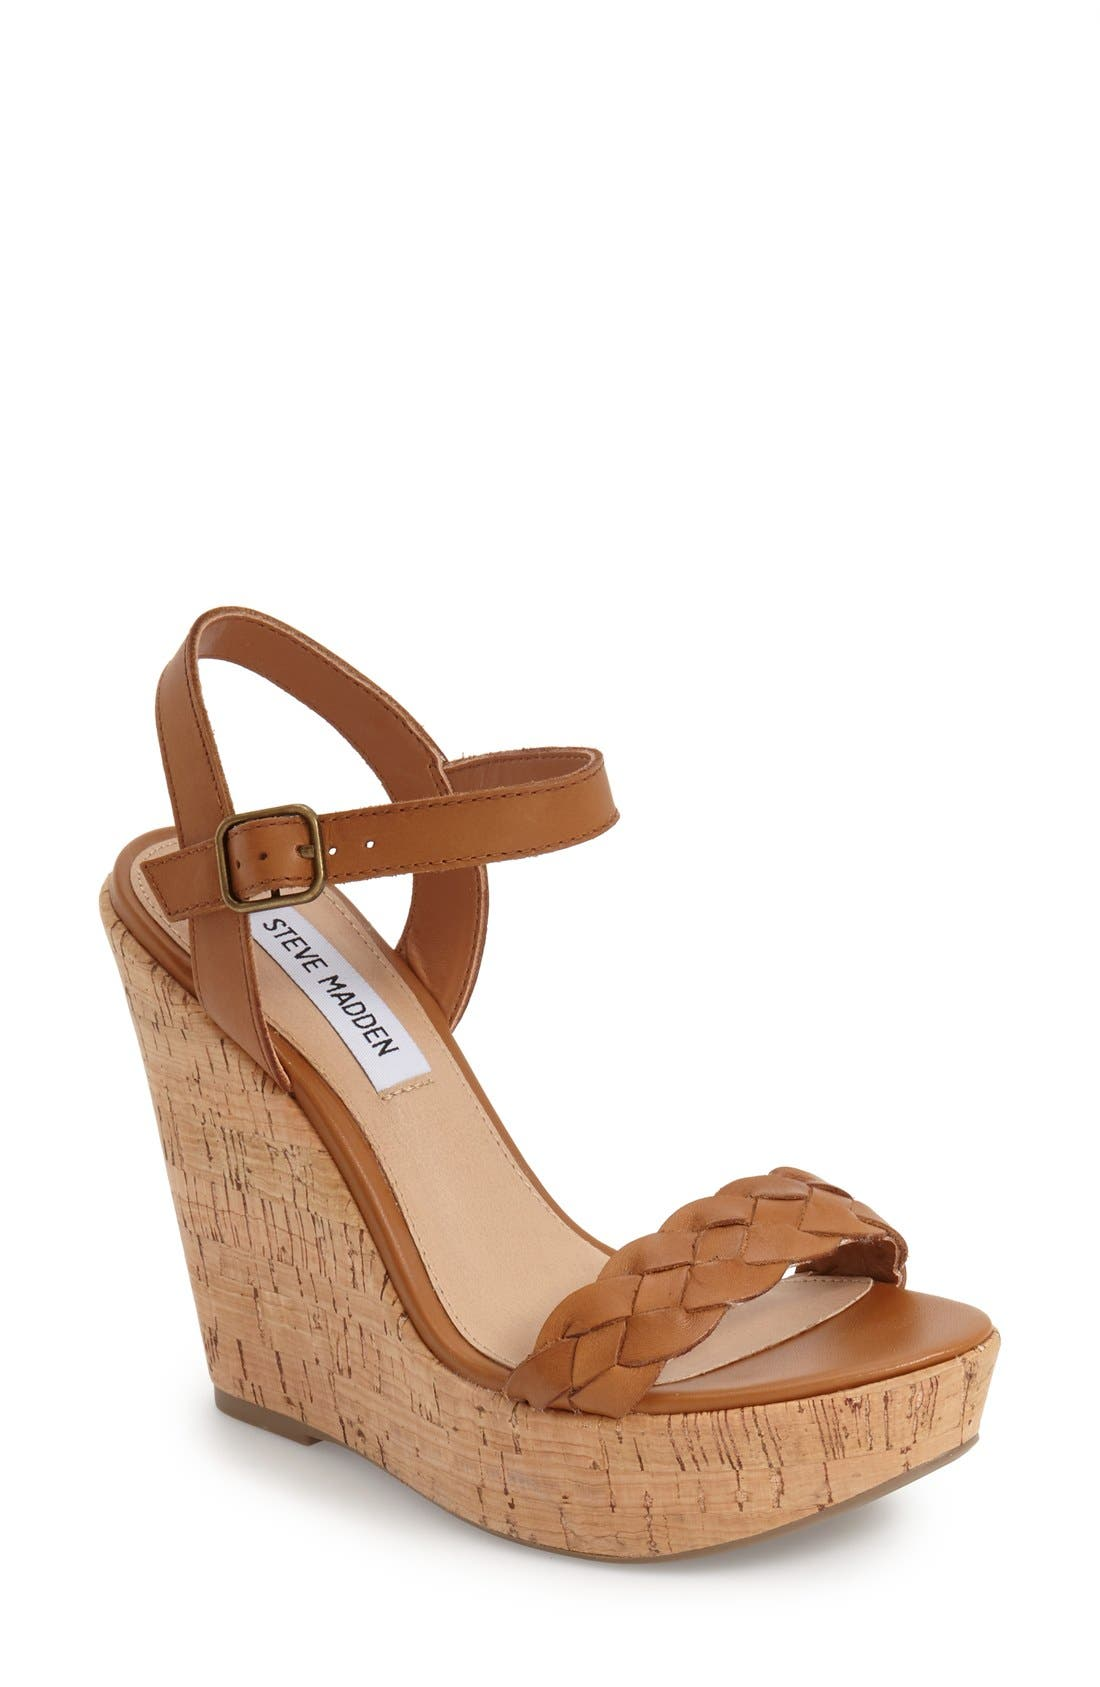 Main Image - Steve Madden 'Emmey' Platform Wedge Sandal (Women)